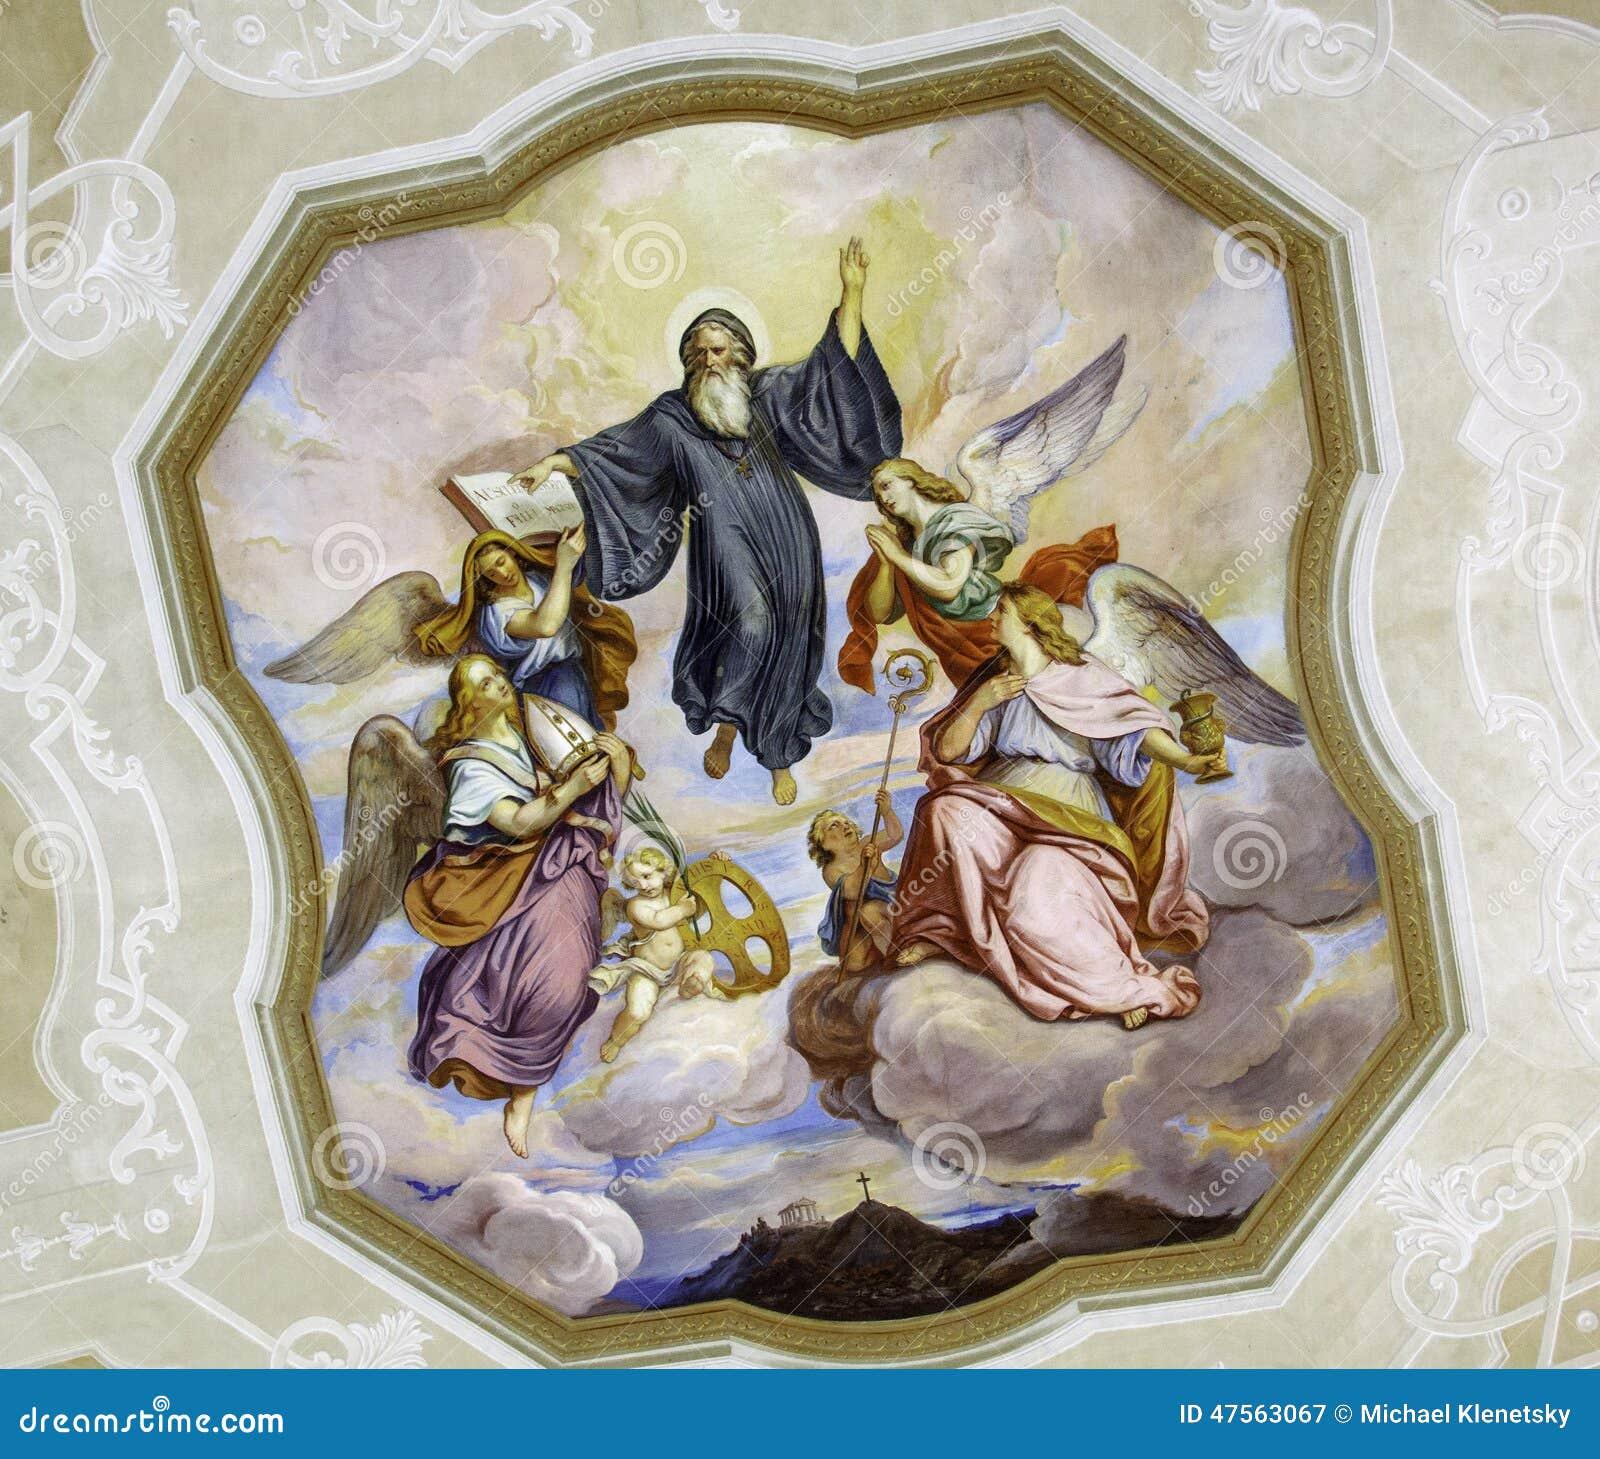 Church art stock photo image 47563067 for Artwork for high ceilings